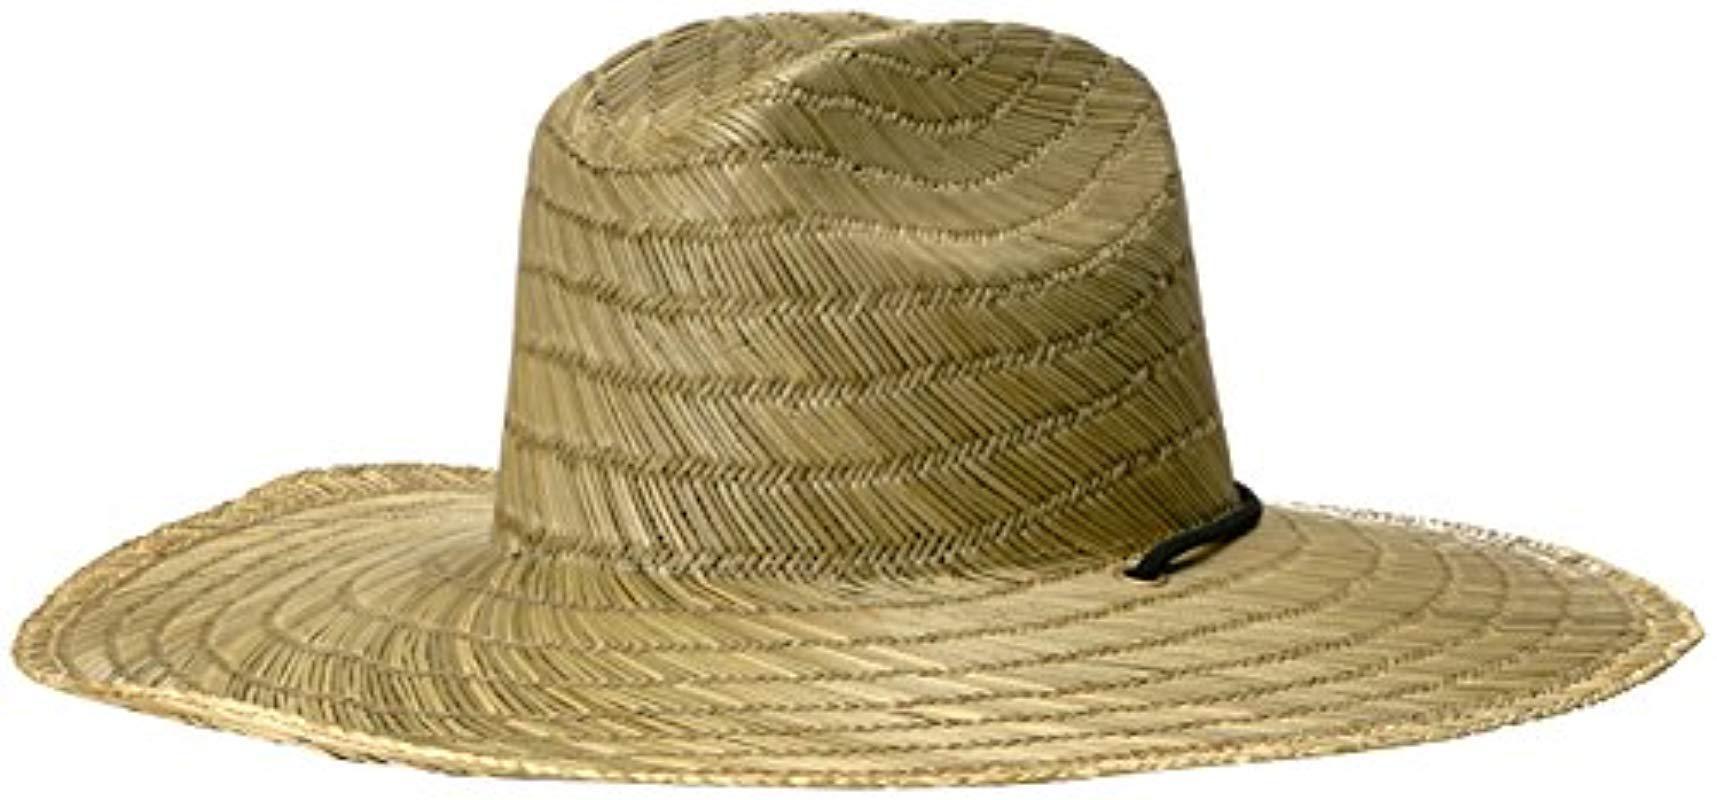 0db21cab ... coupon code quiksilver multicolor destinado pierside sun hat for men  lyst. view fullscreen e9ef0 77f45